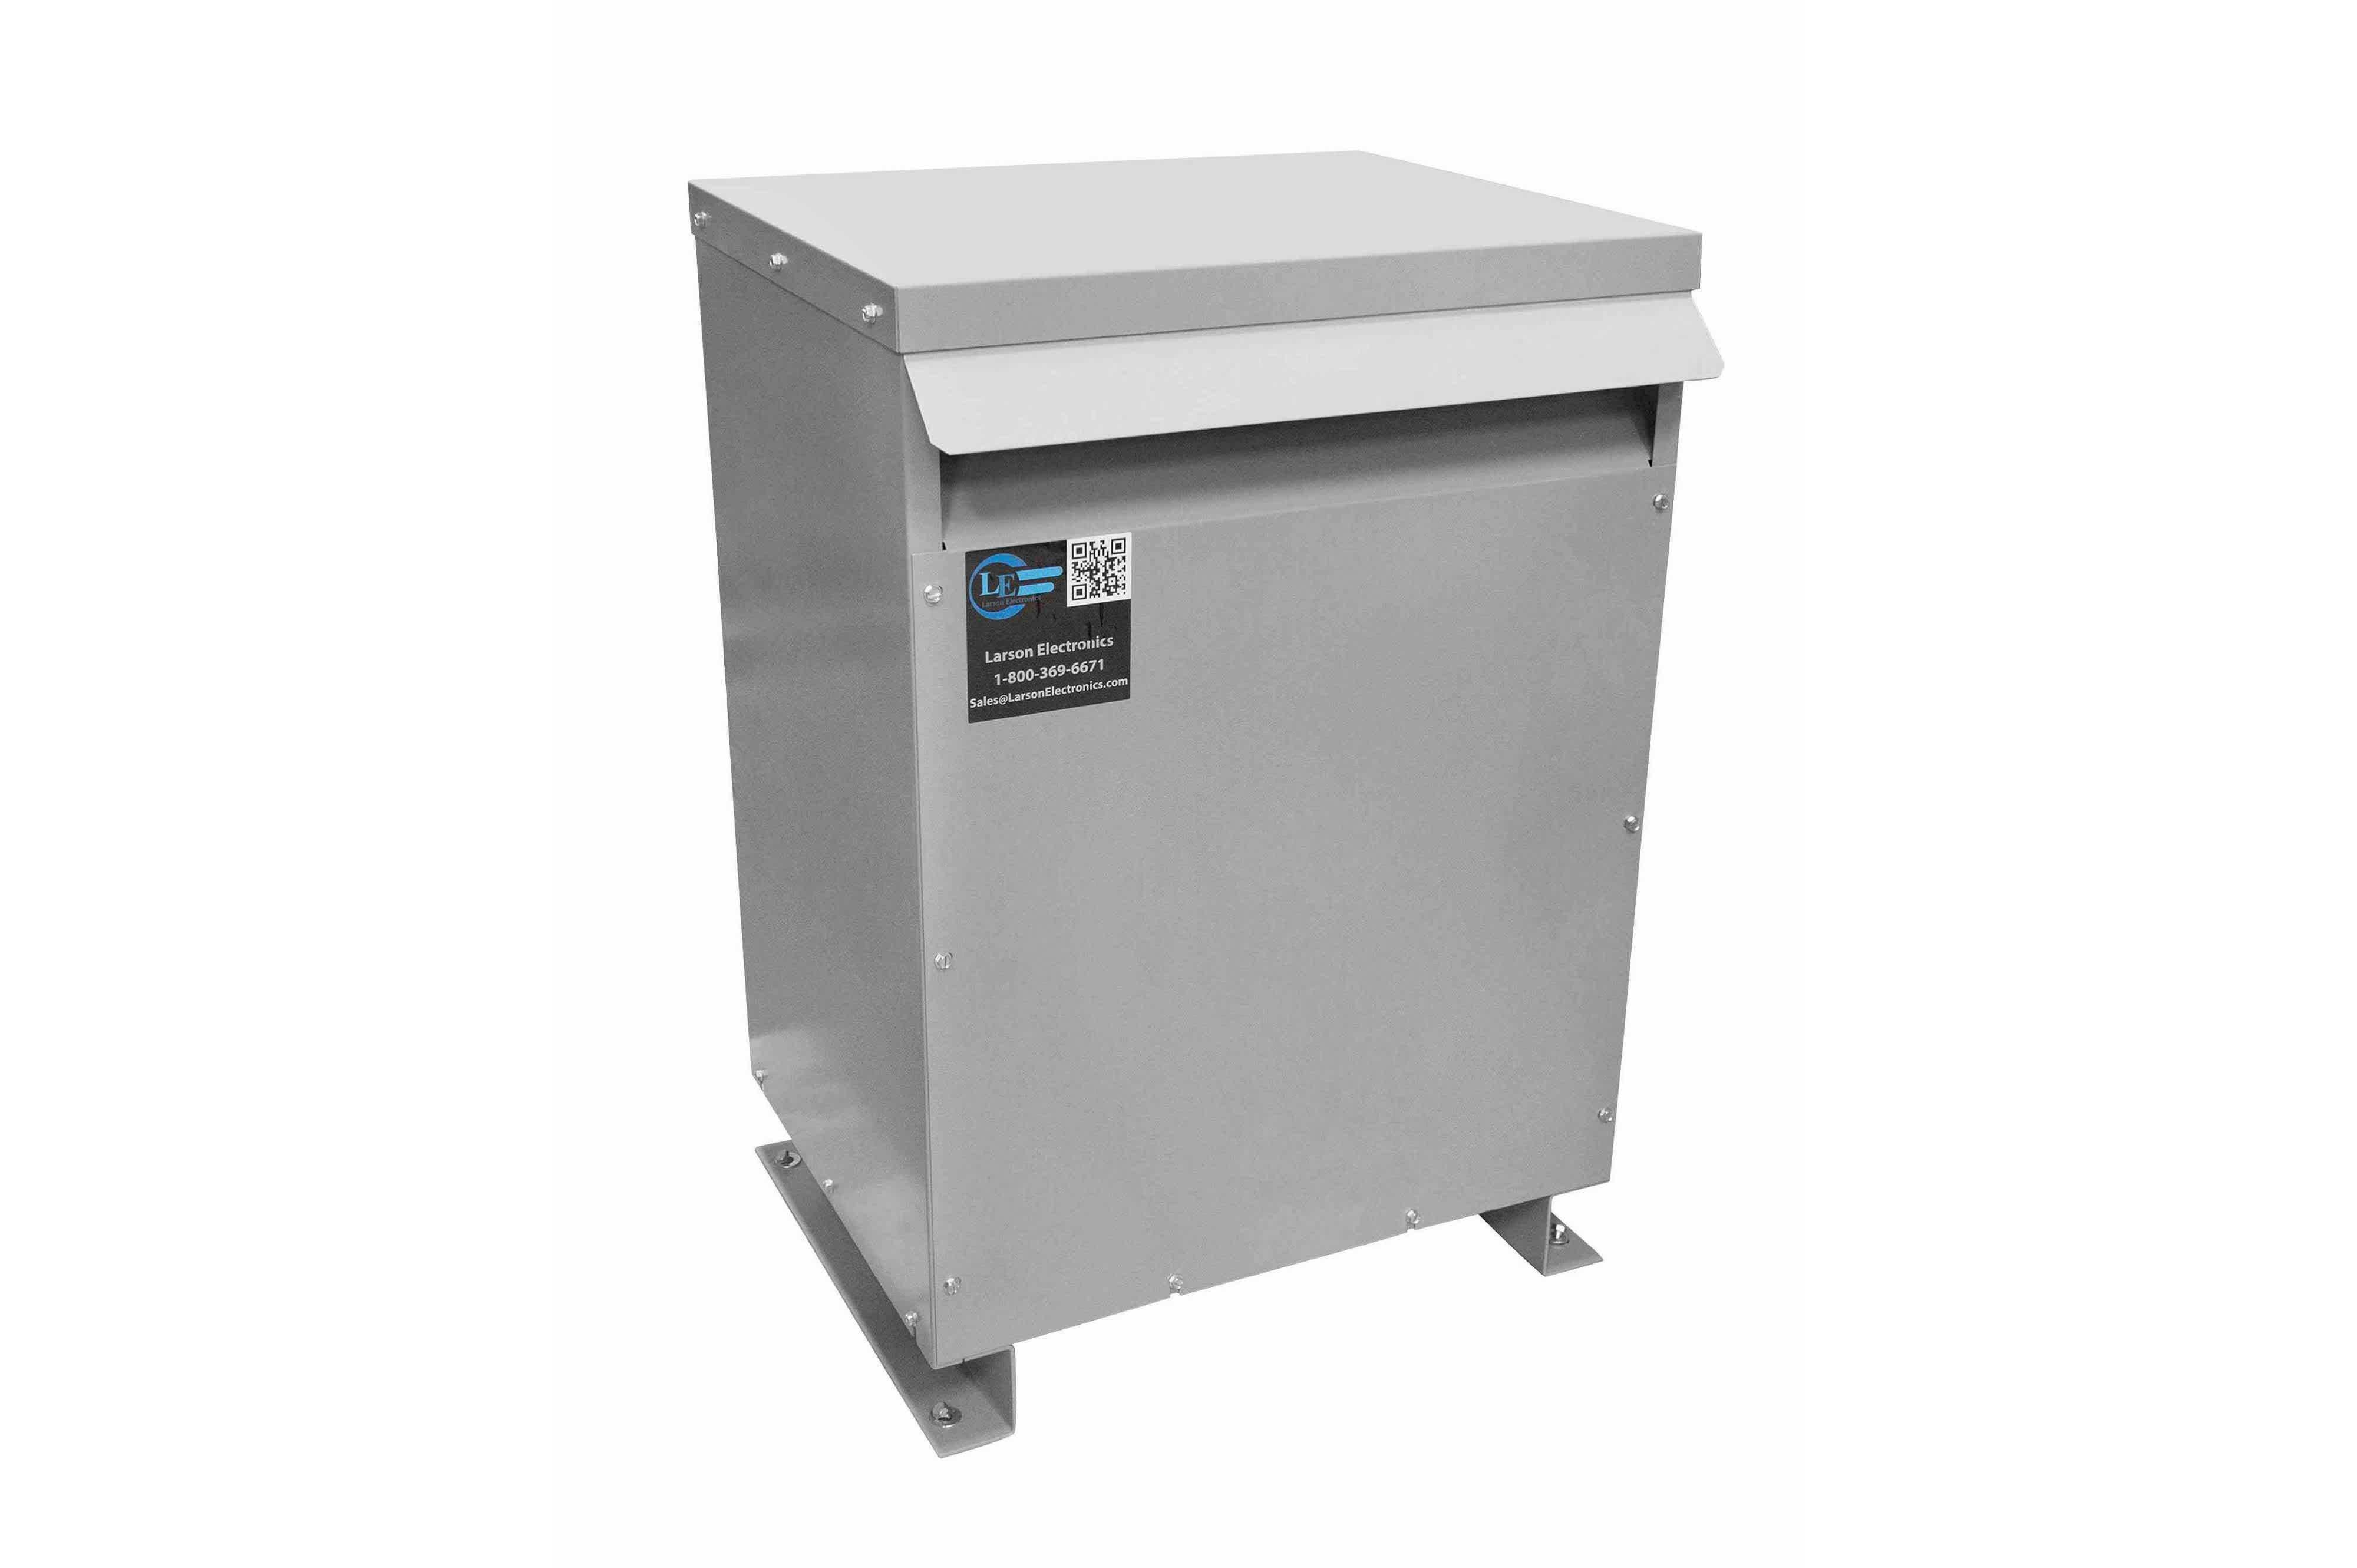 38 kVA 3PH Isolation Transformer, 240V Wye Primary, 208V Delta Secondary, N3R, Ventilated, 60 Hz